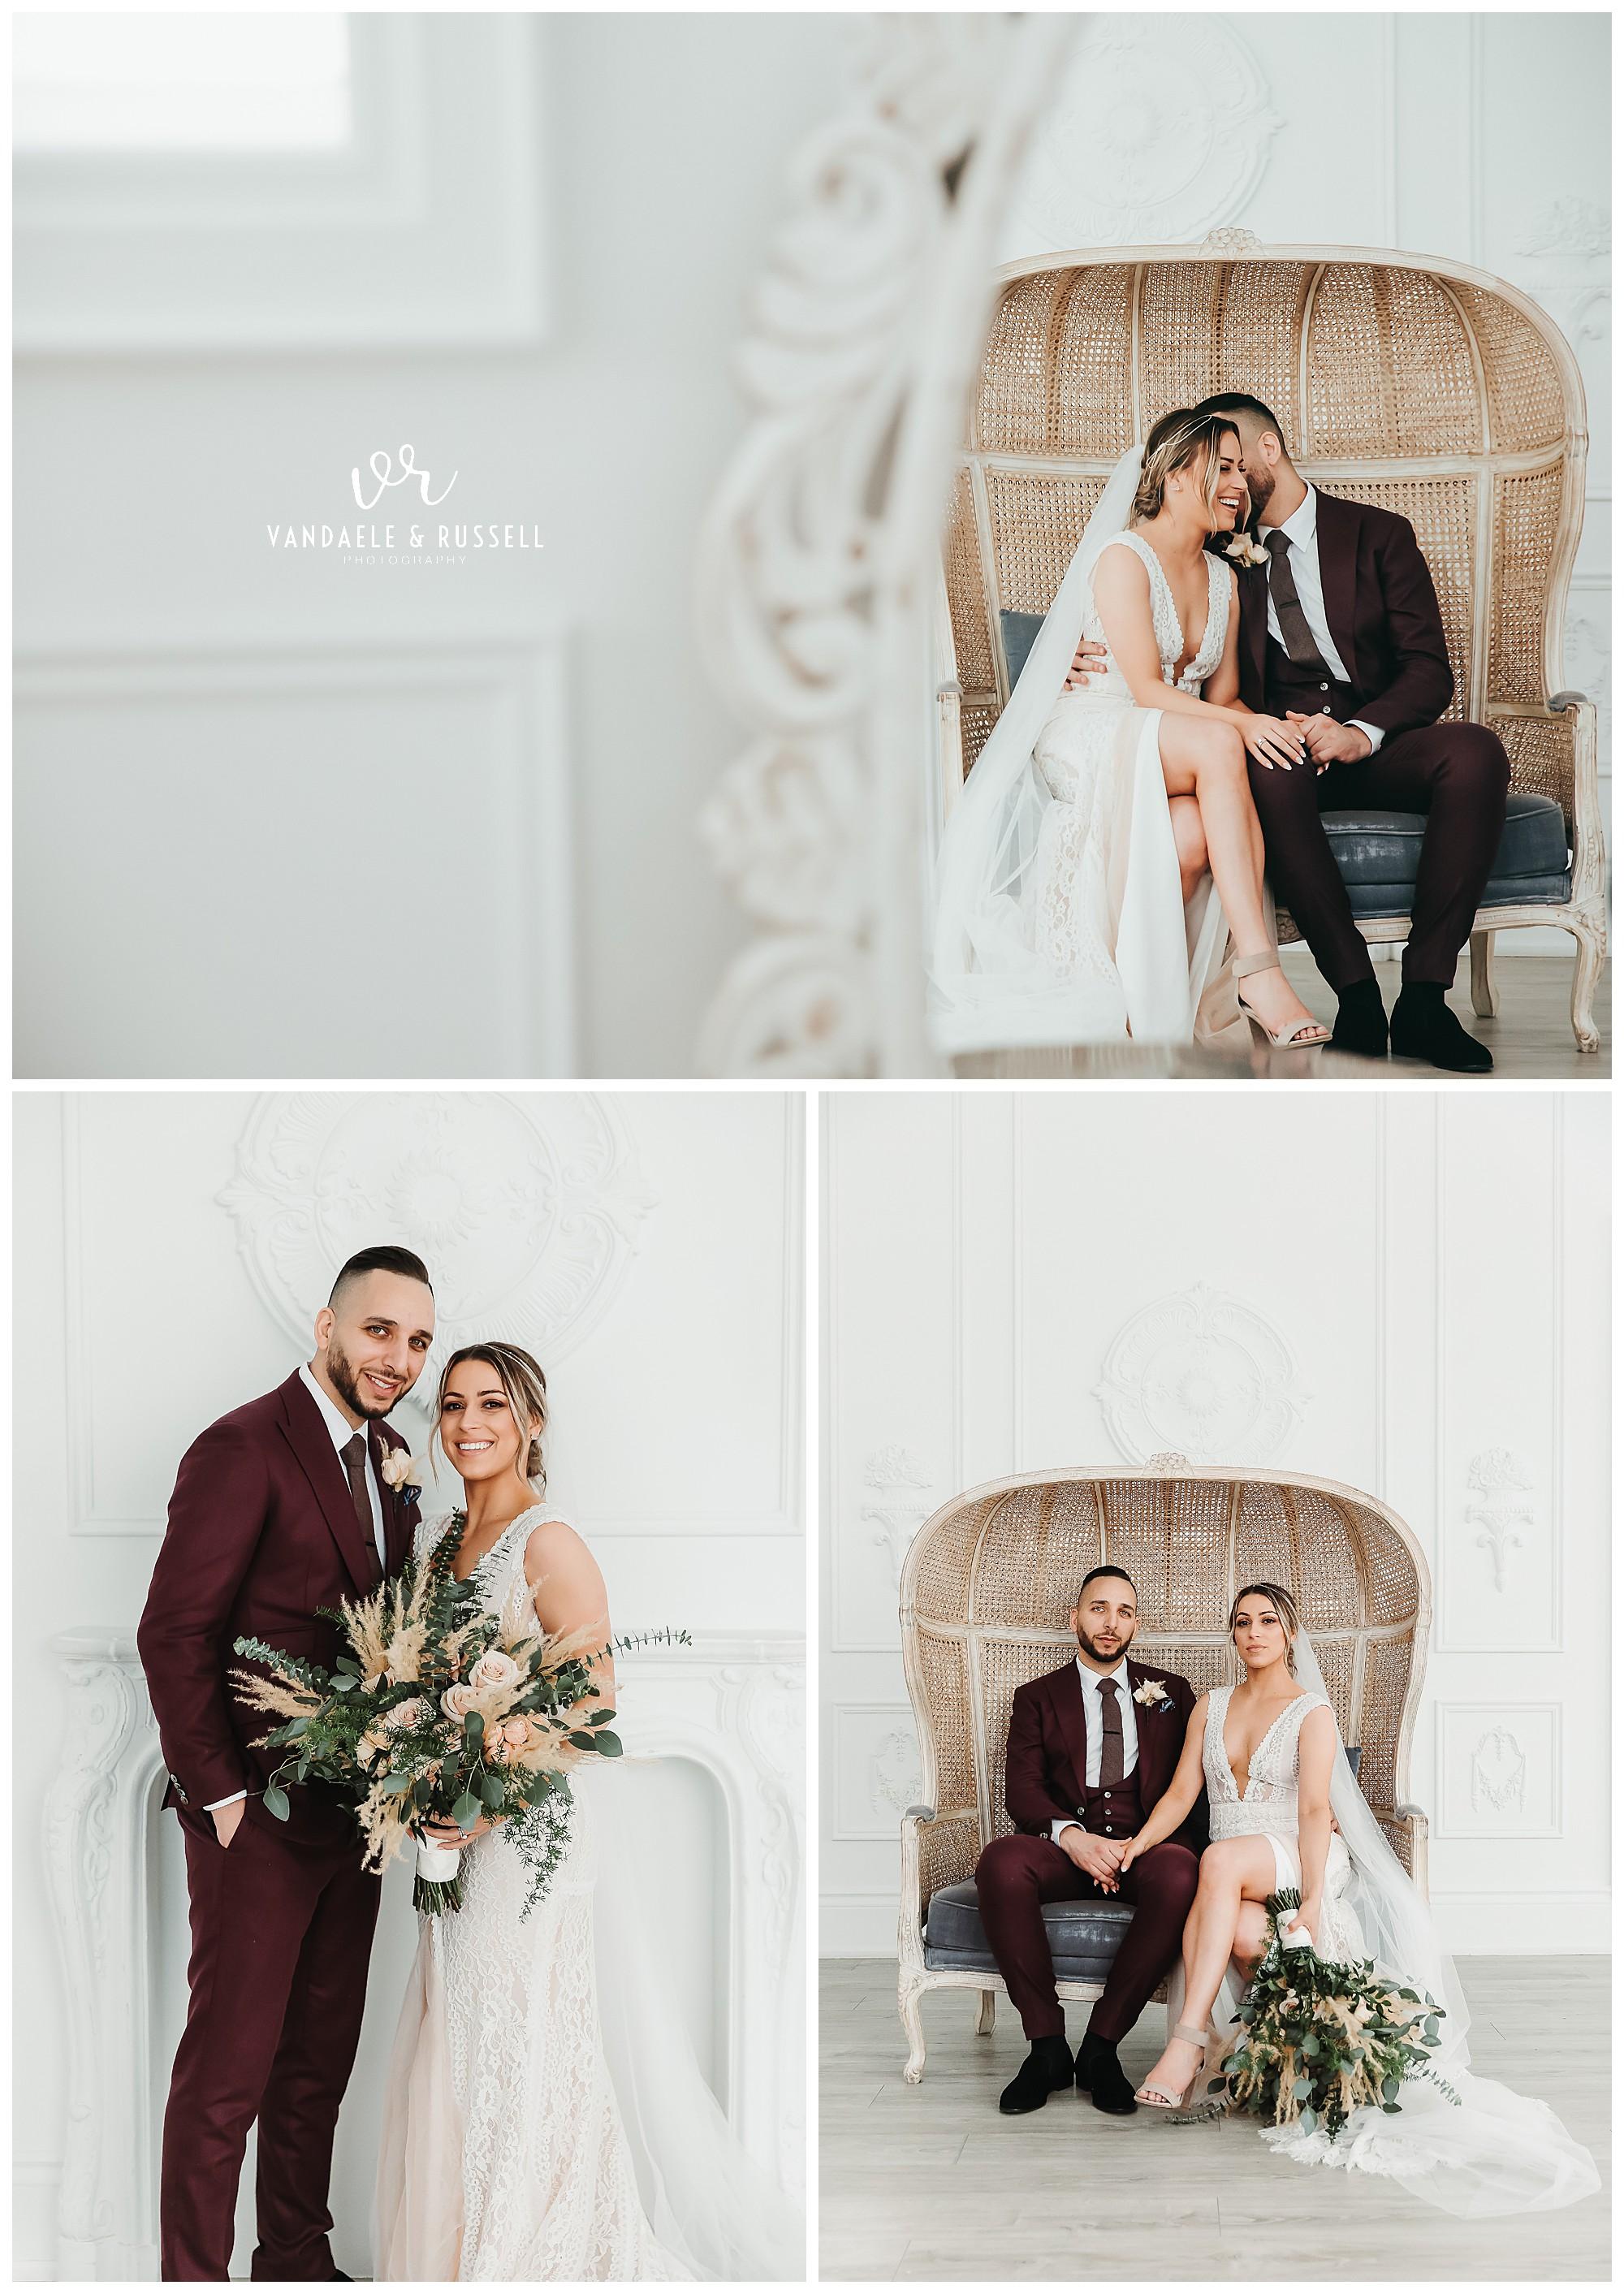 Joanna-Christos-Grand-Luxe-Wedding-Photos-Mint-Room-Toronto-VanDaele-Russell_0086.jpg